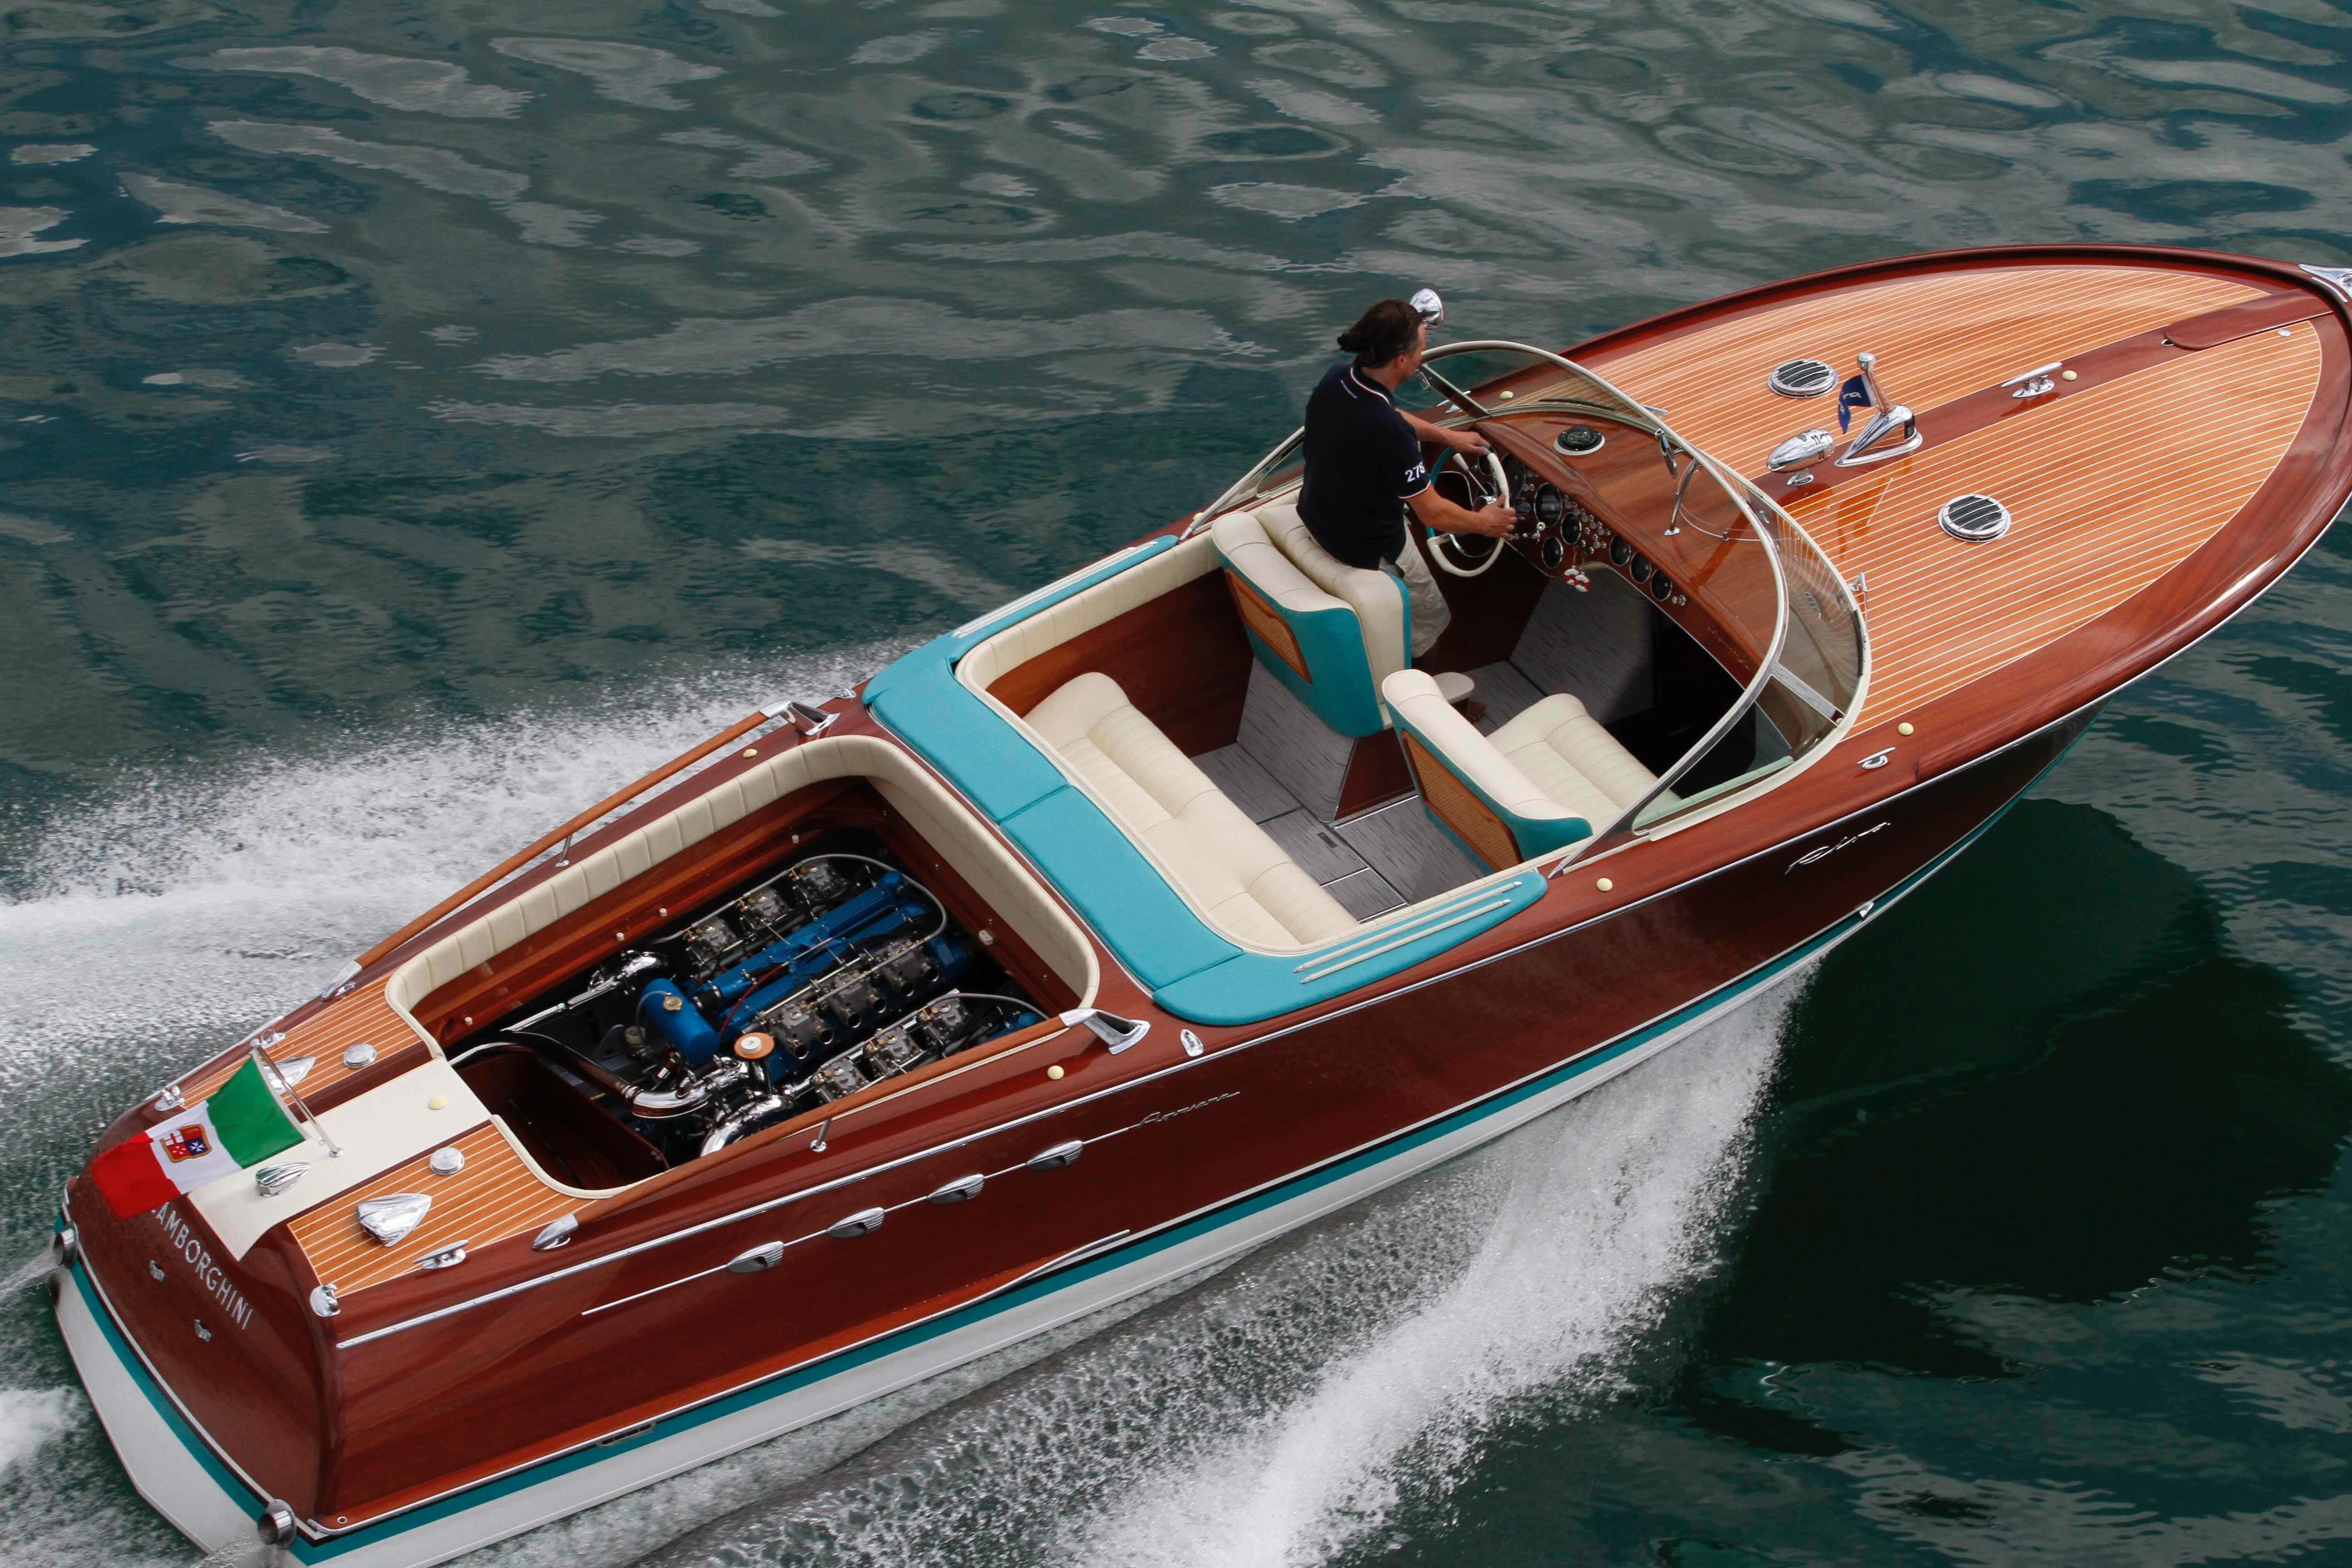 1968 Riva Aquarama Lamborghini Power Boat For Sale Www Yachtworld Com Runabout Boat Boat Mahogany Boat